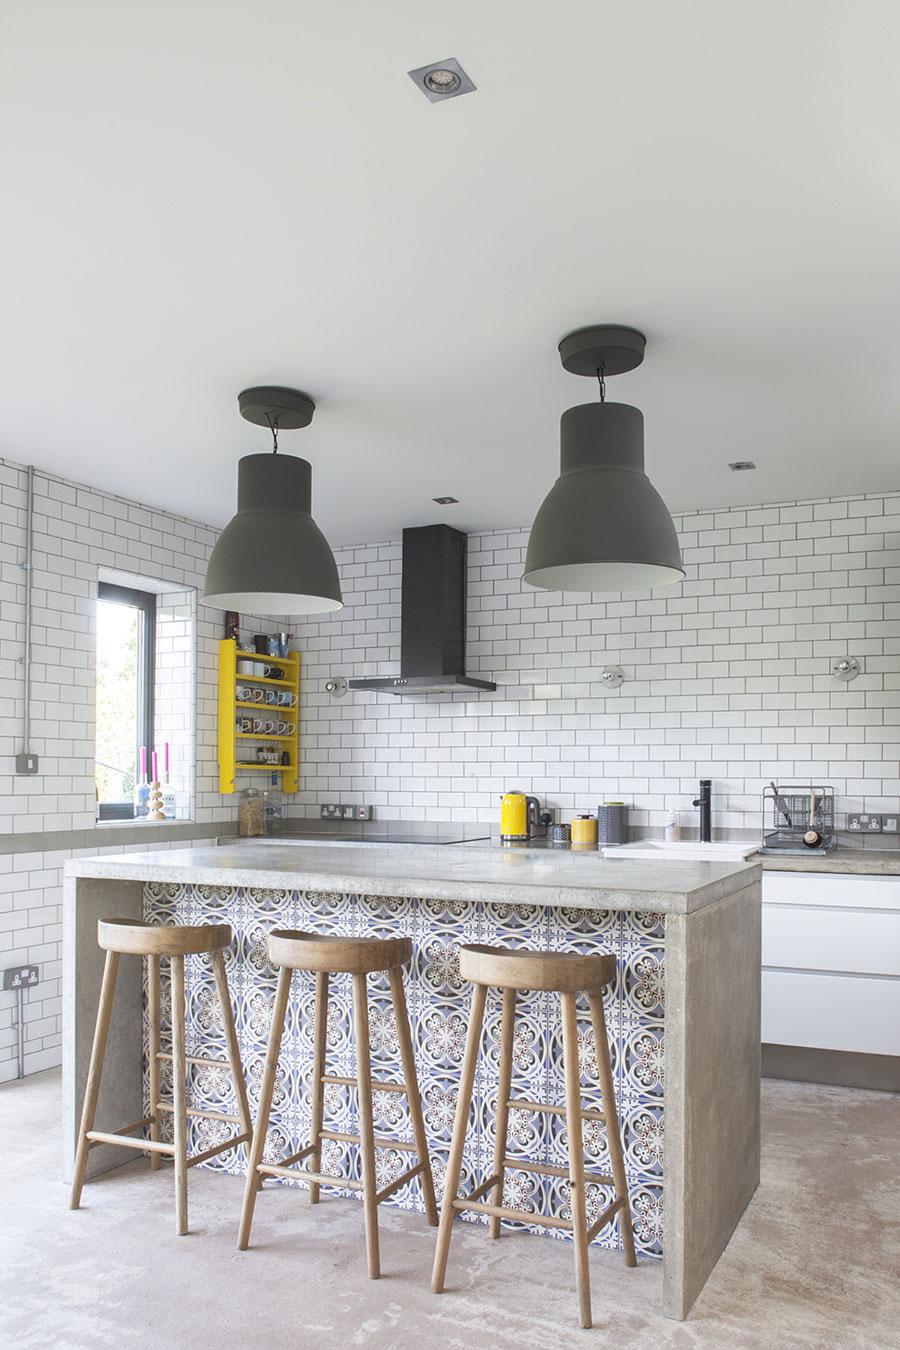 industrieel interieur betonnen keukenblad